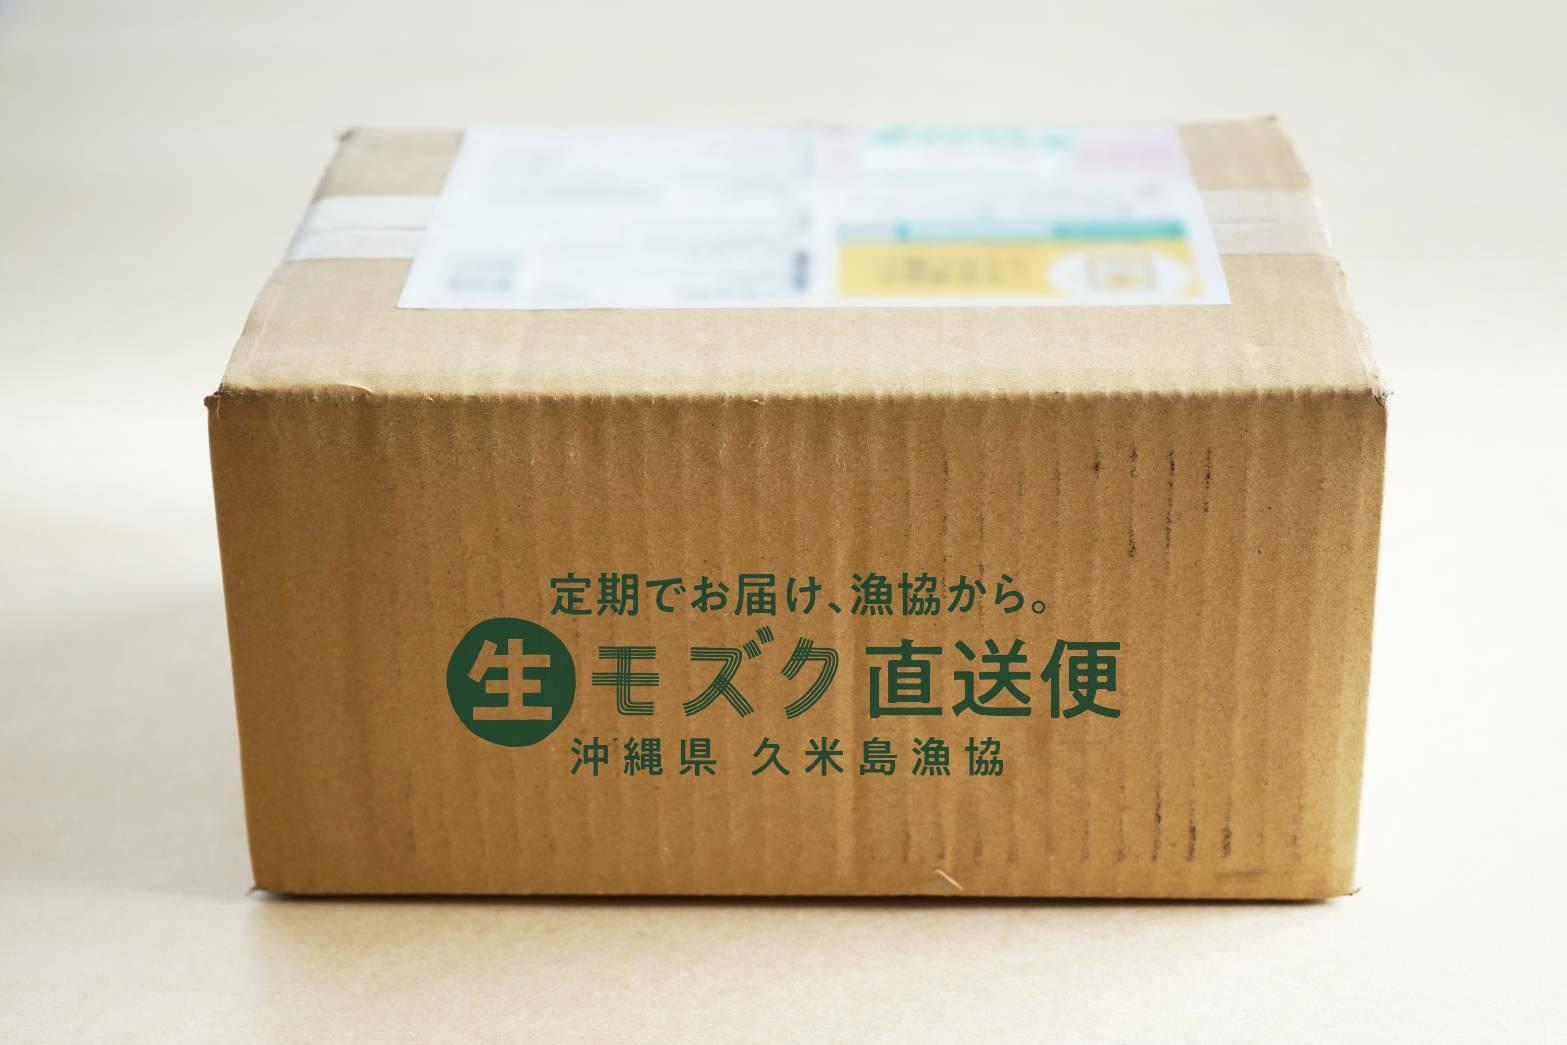 item_namamozuku_3chokusou_300g10pc2tare